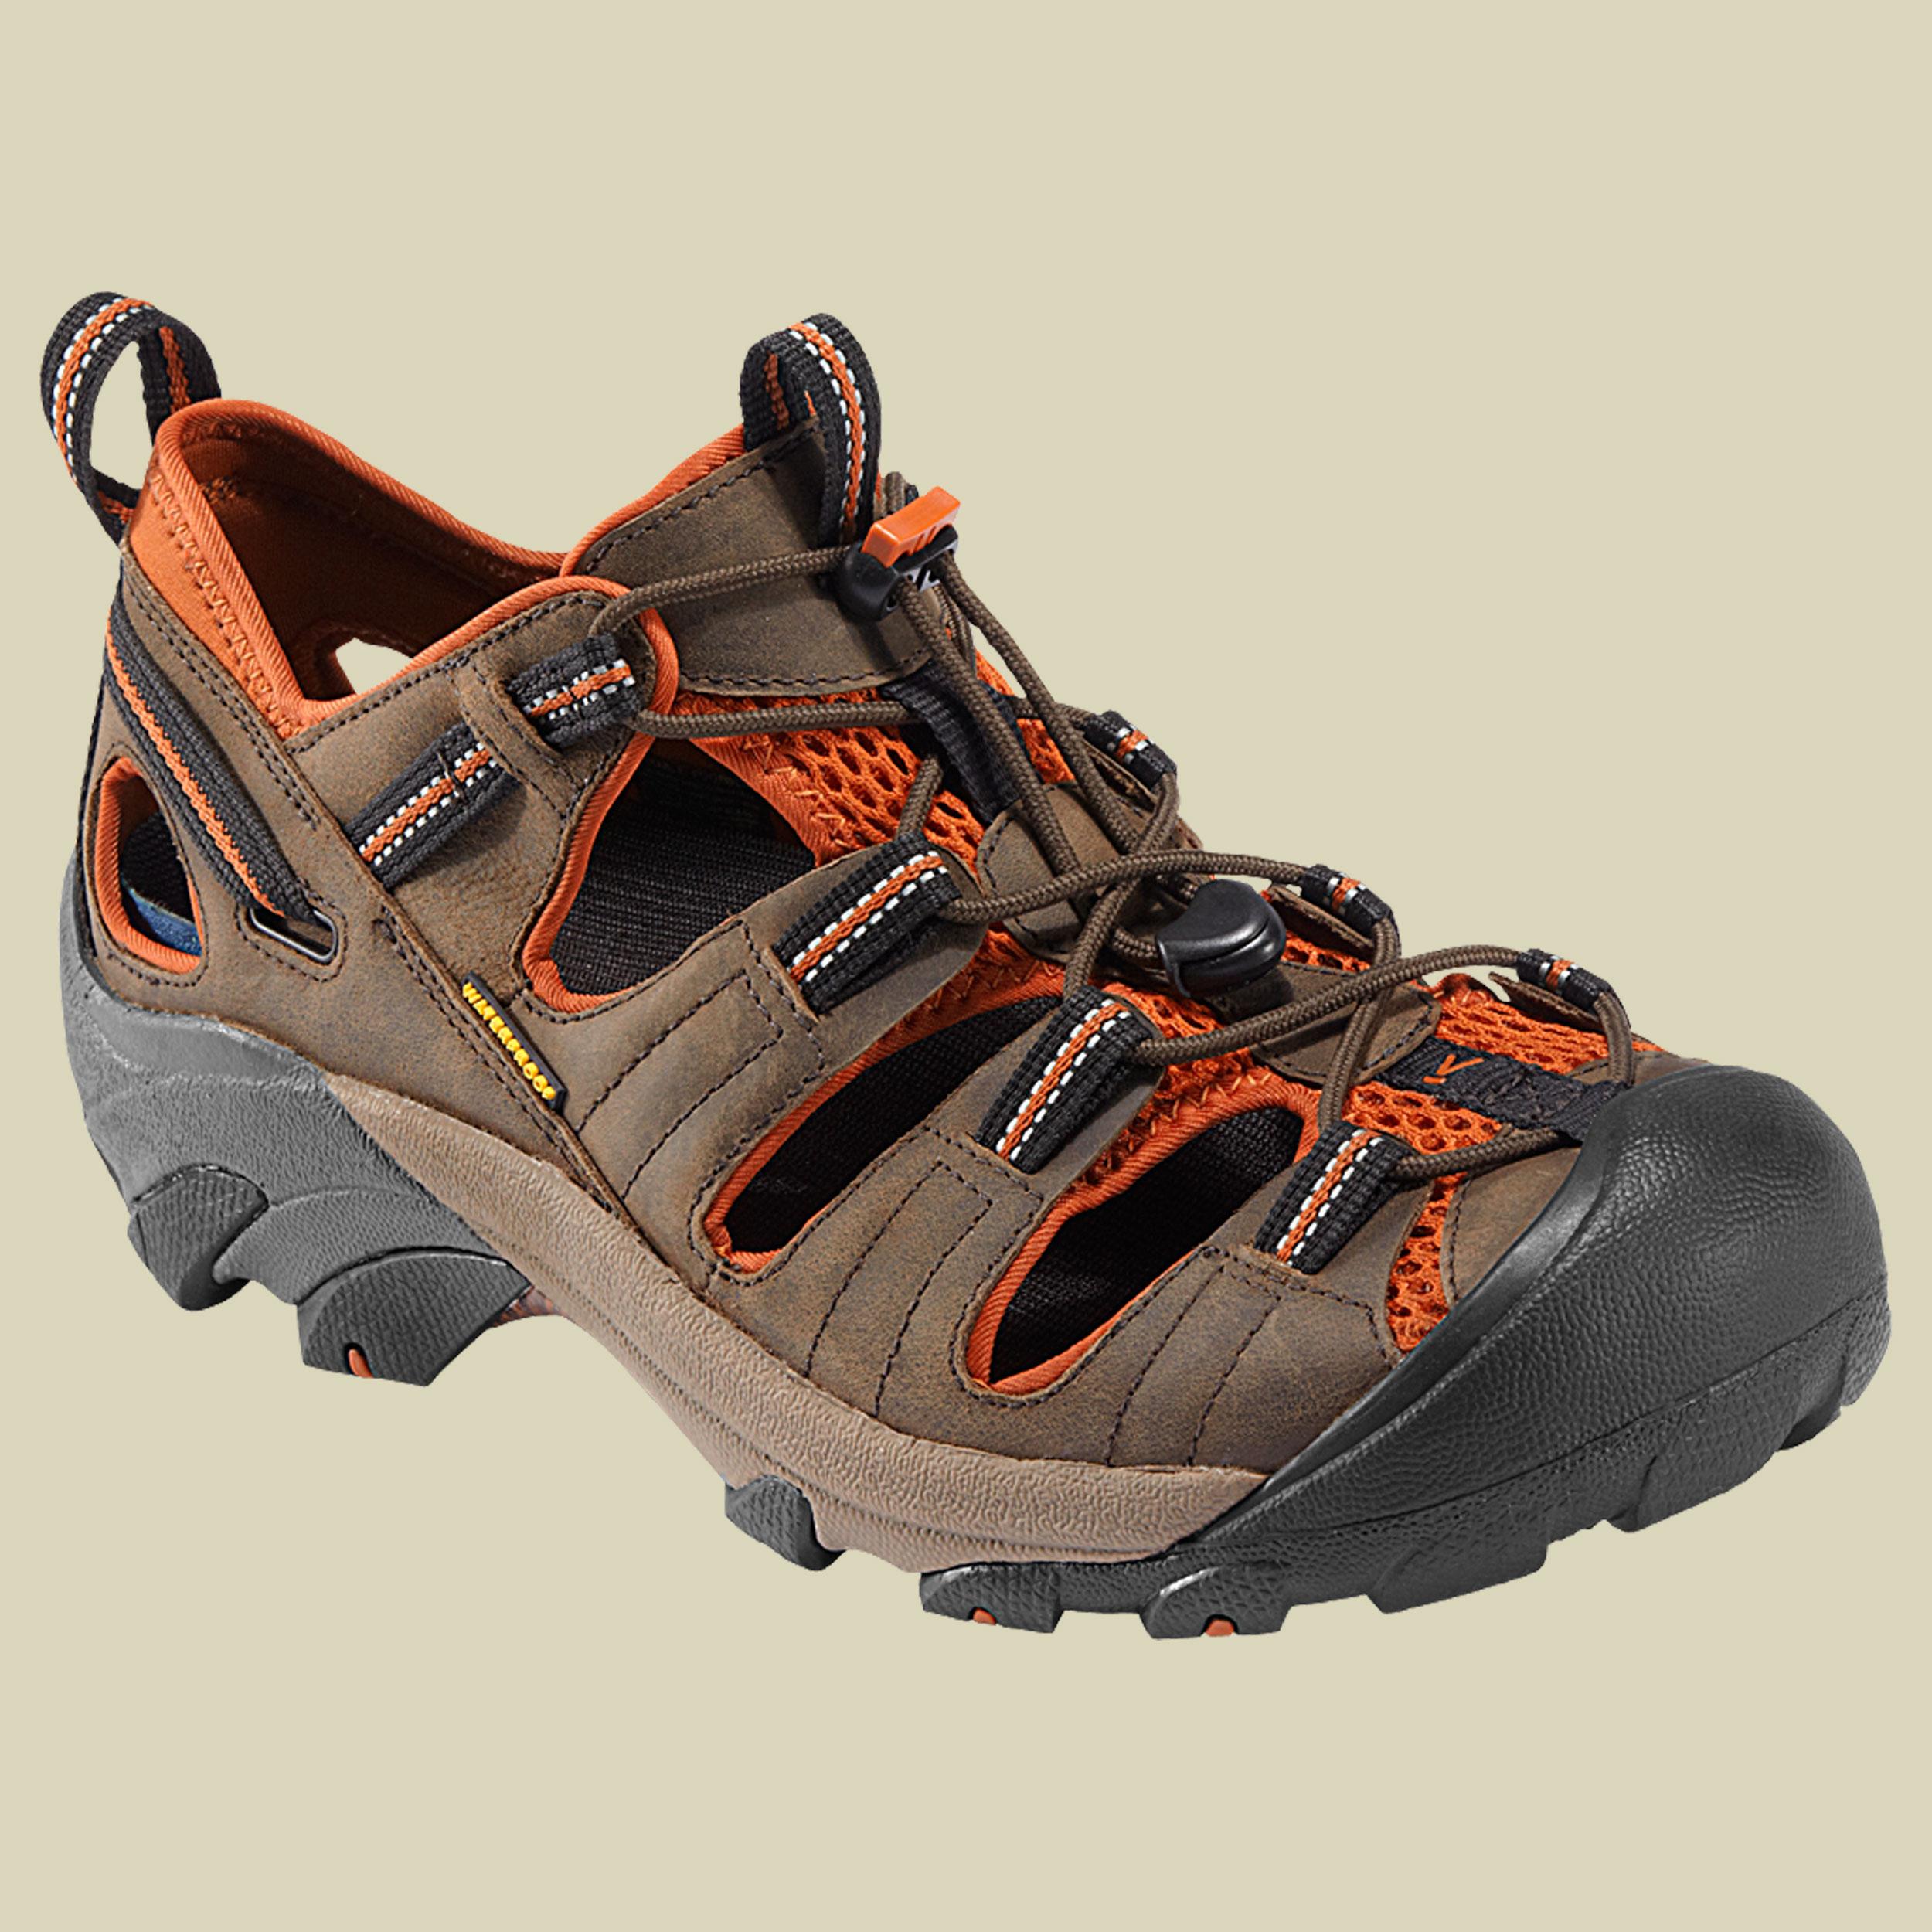 Keen Arroyo II Men Sandale Herren Größe UK 13 black-olive/bombay brown